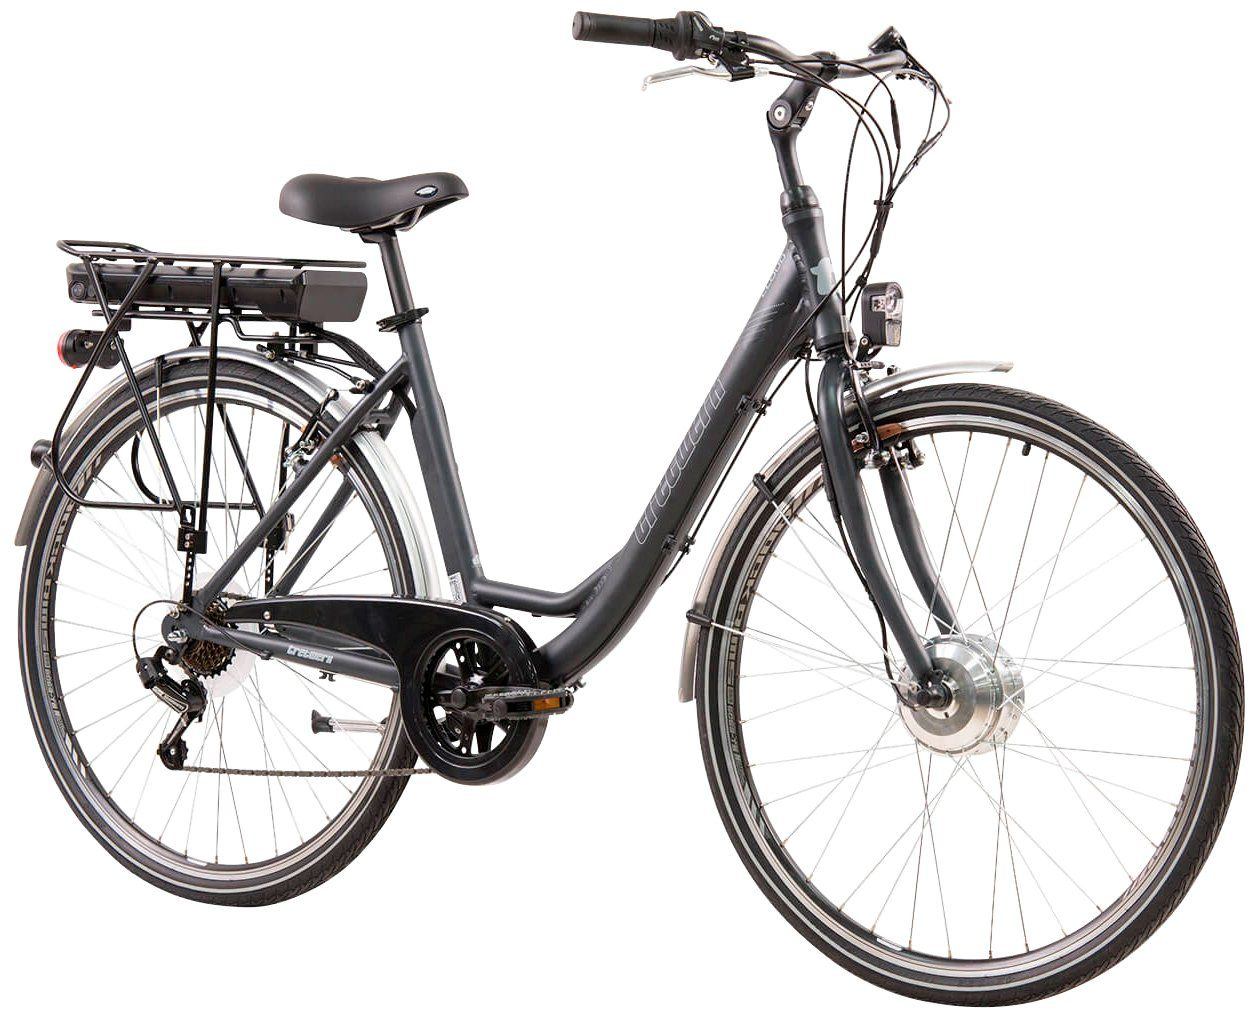 TRETWERK E-Bike City Damen »Cloud 1.0«, 28 Zoll, 7 Gang, Frontmotor, 374 Wh